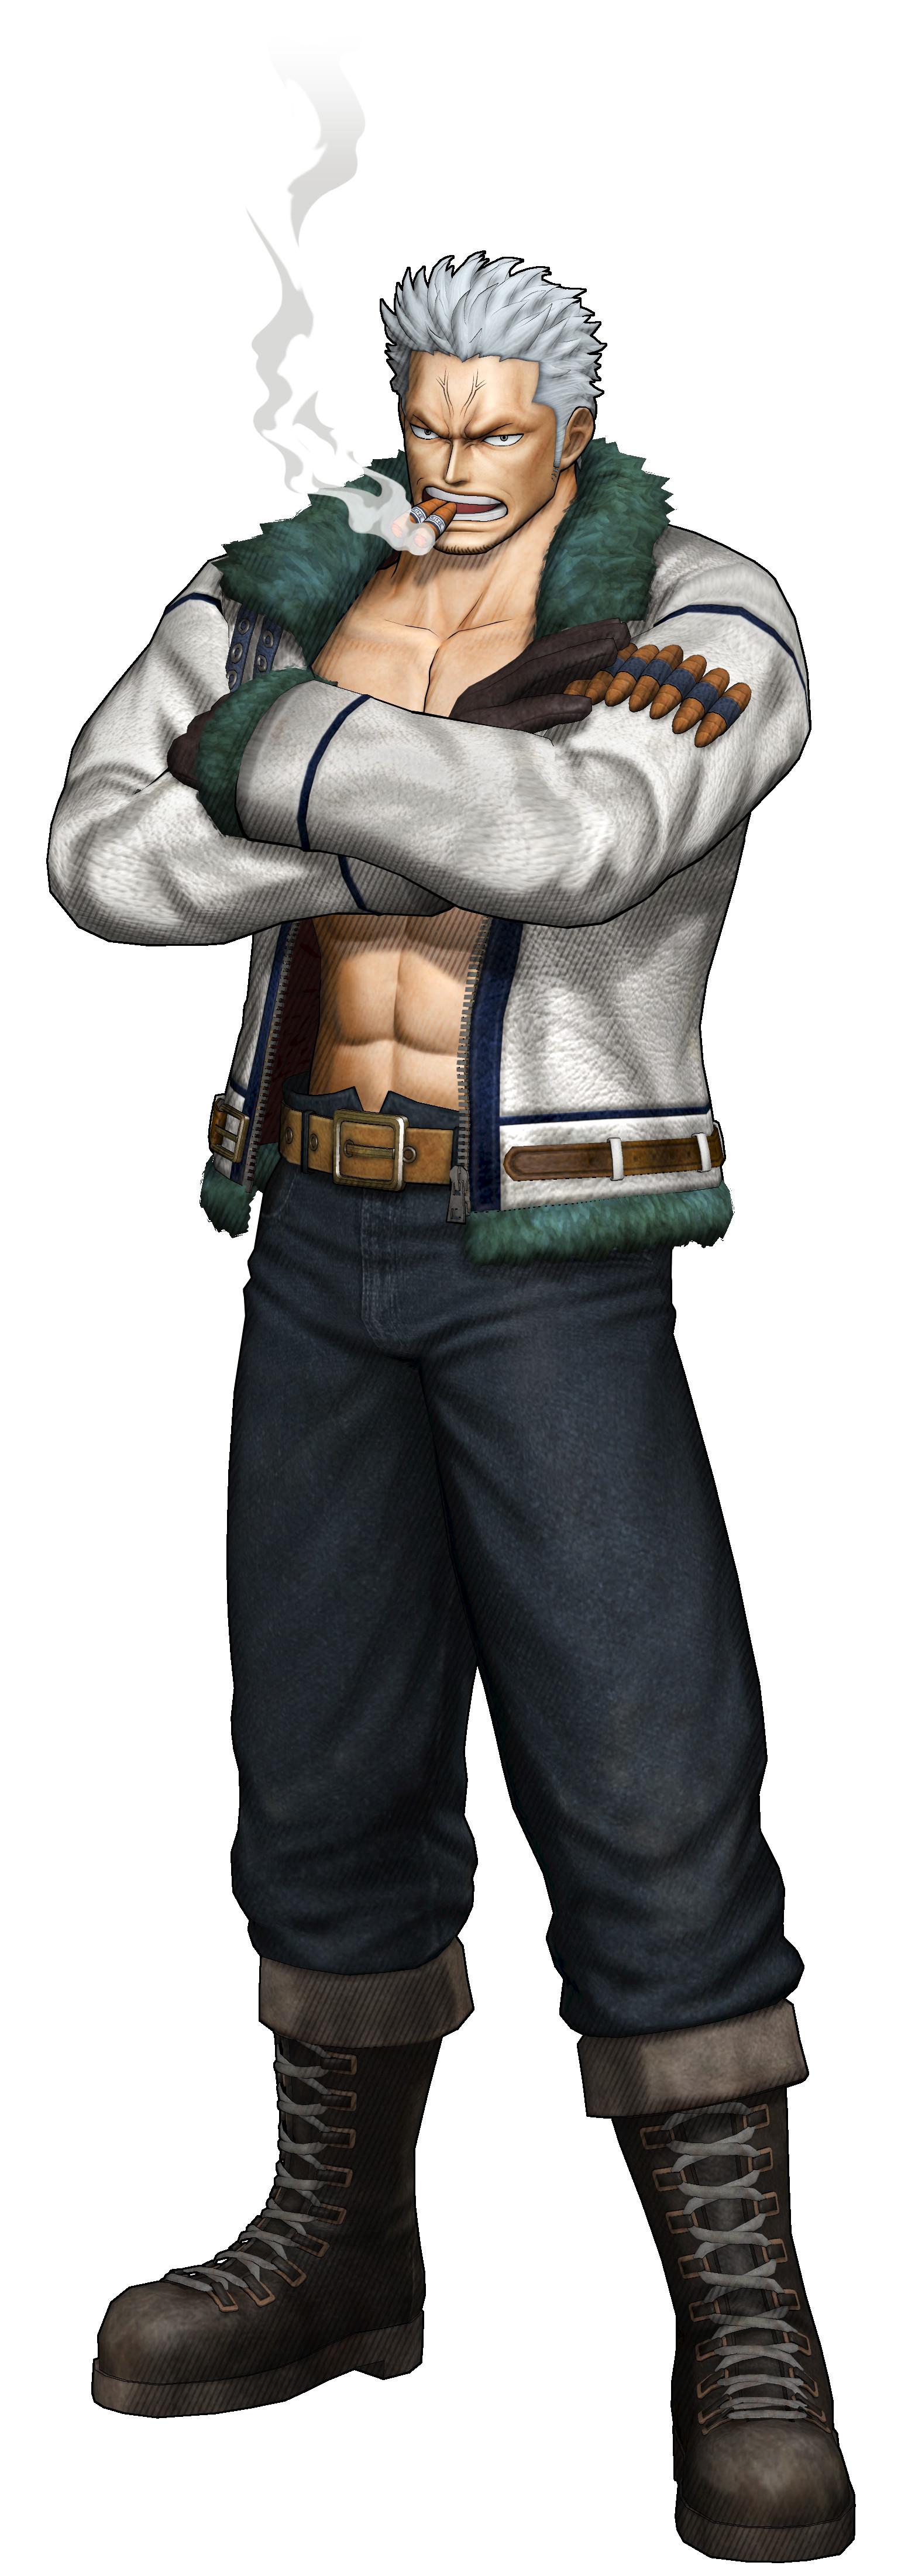 Smoker - The One Piece Wiki - Manga, Anime, Pirates ...